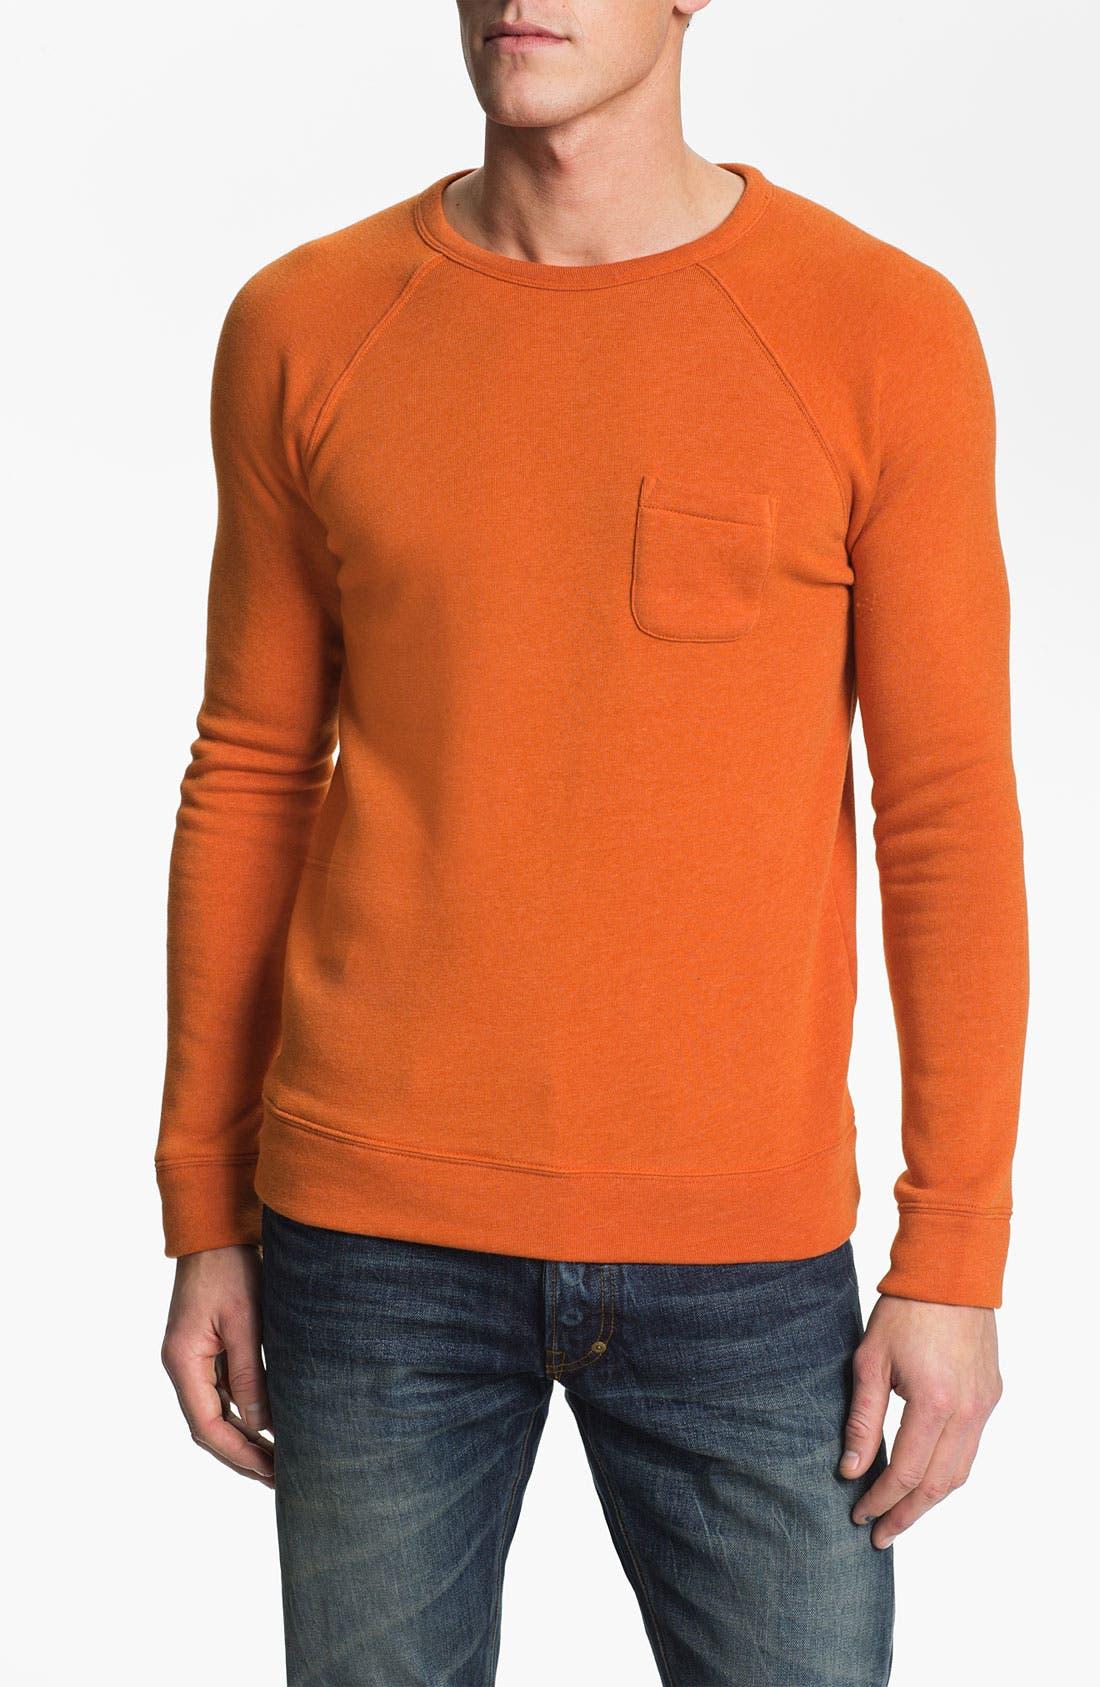 Lofty Creature Comforts Crewneck Sweatshirt,                             Main thumbnail 1, color,                             Apricot